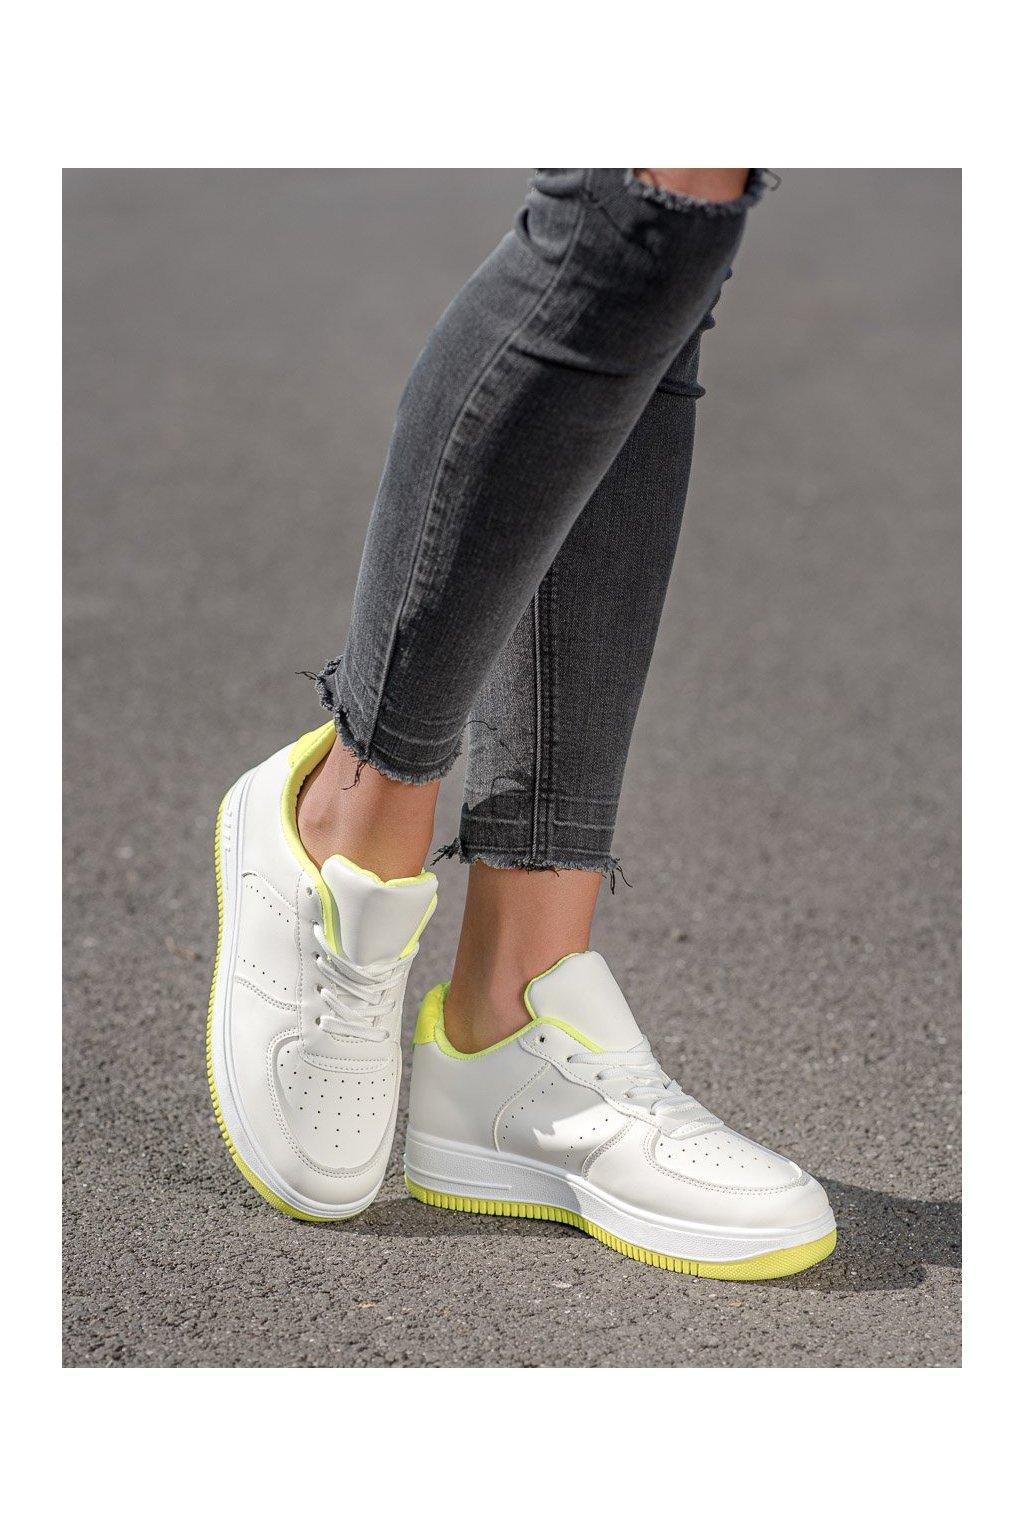 Biele tenisky Shelovet kod BL3619Y